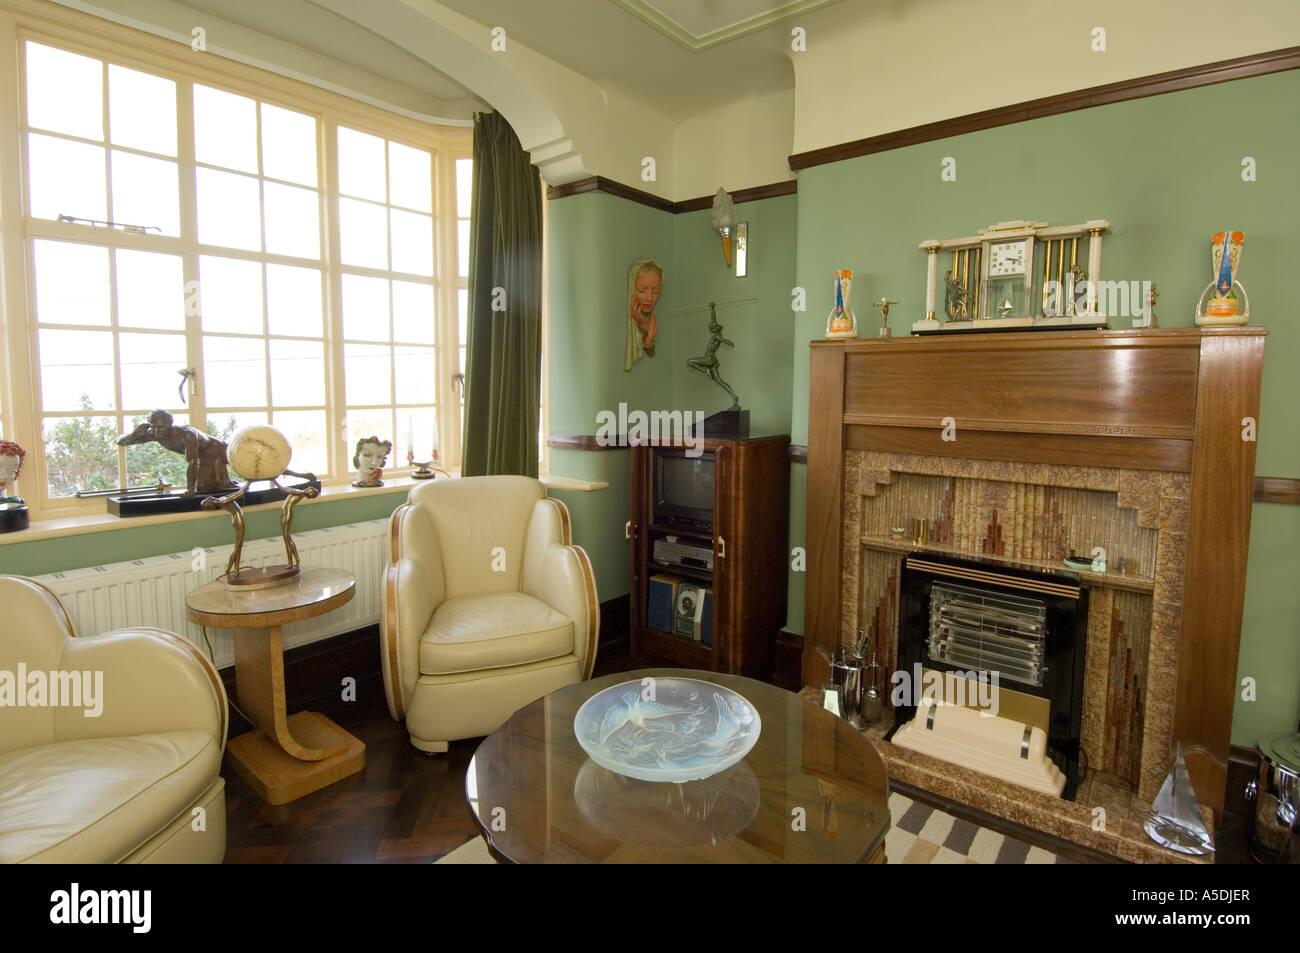 art dco rnov 1930 s chambre salon salon intrieur aprs midi uk